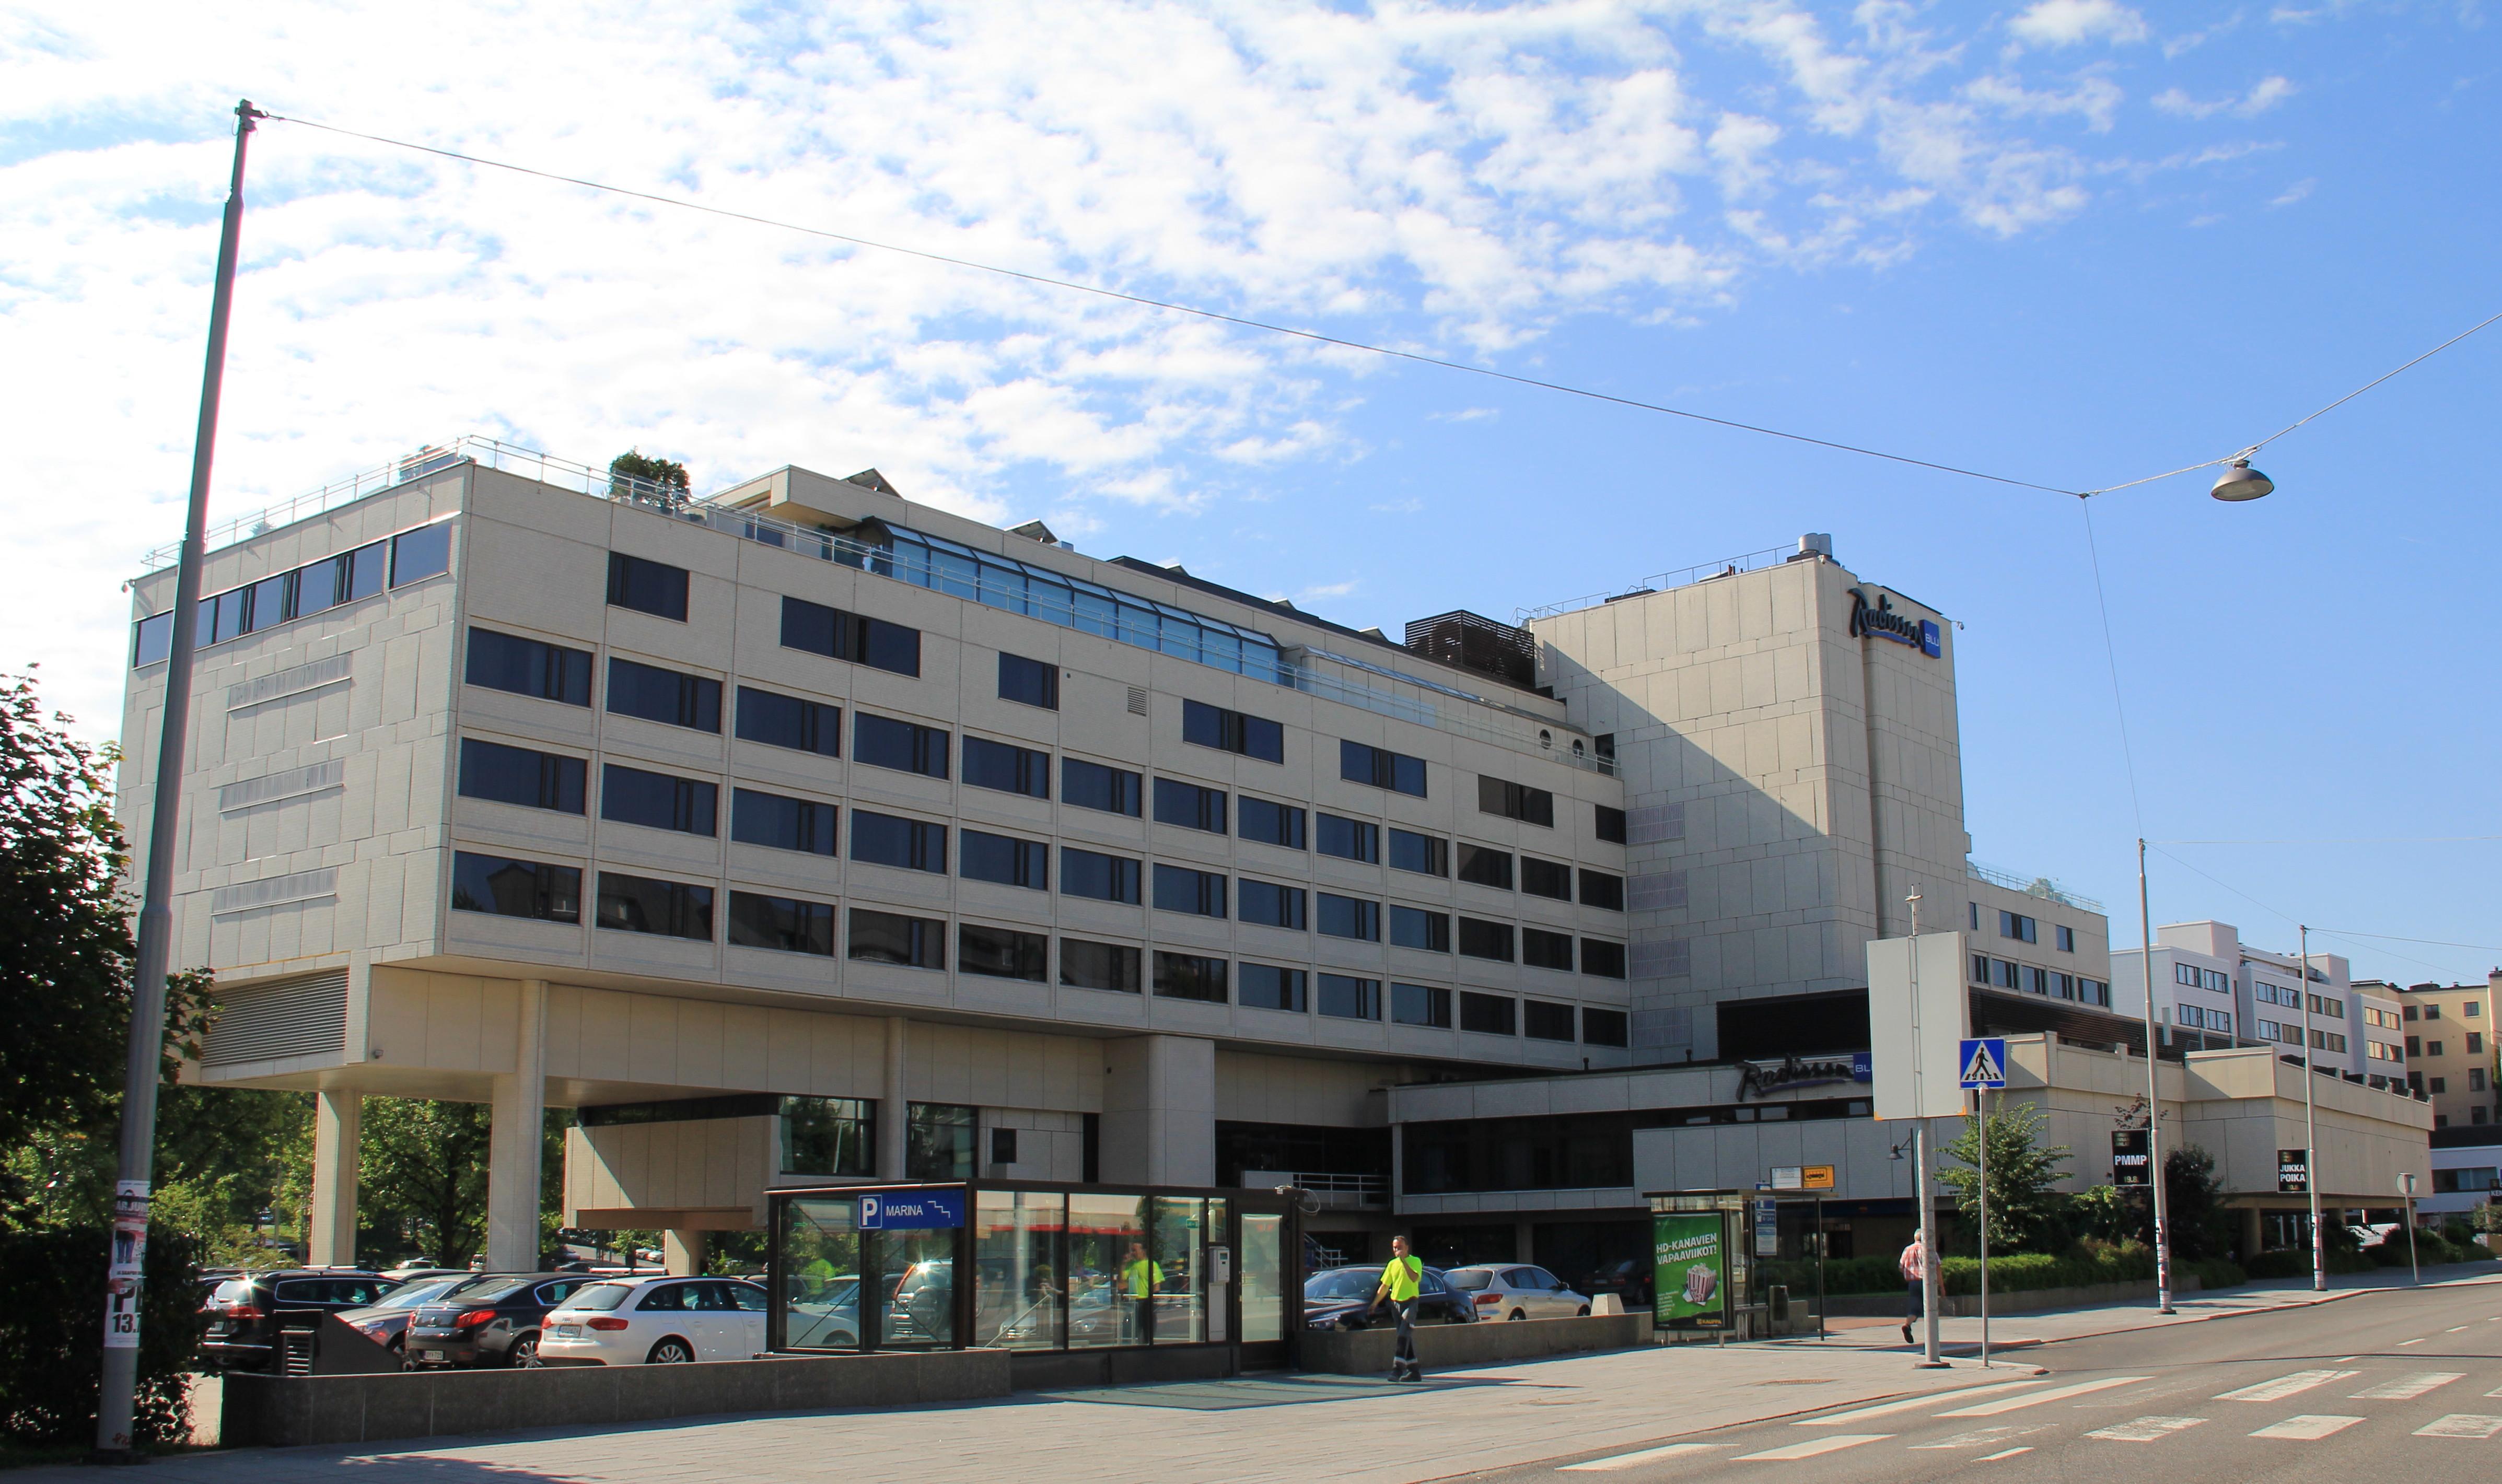 Radisson Blu Palace Hotel Noordwijk Booking